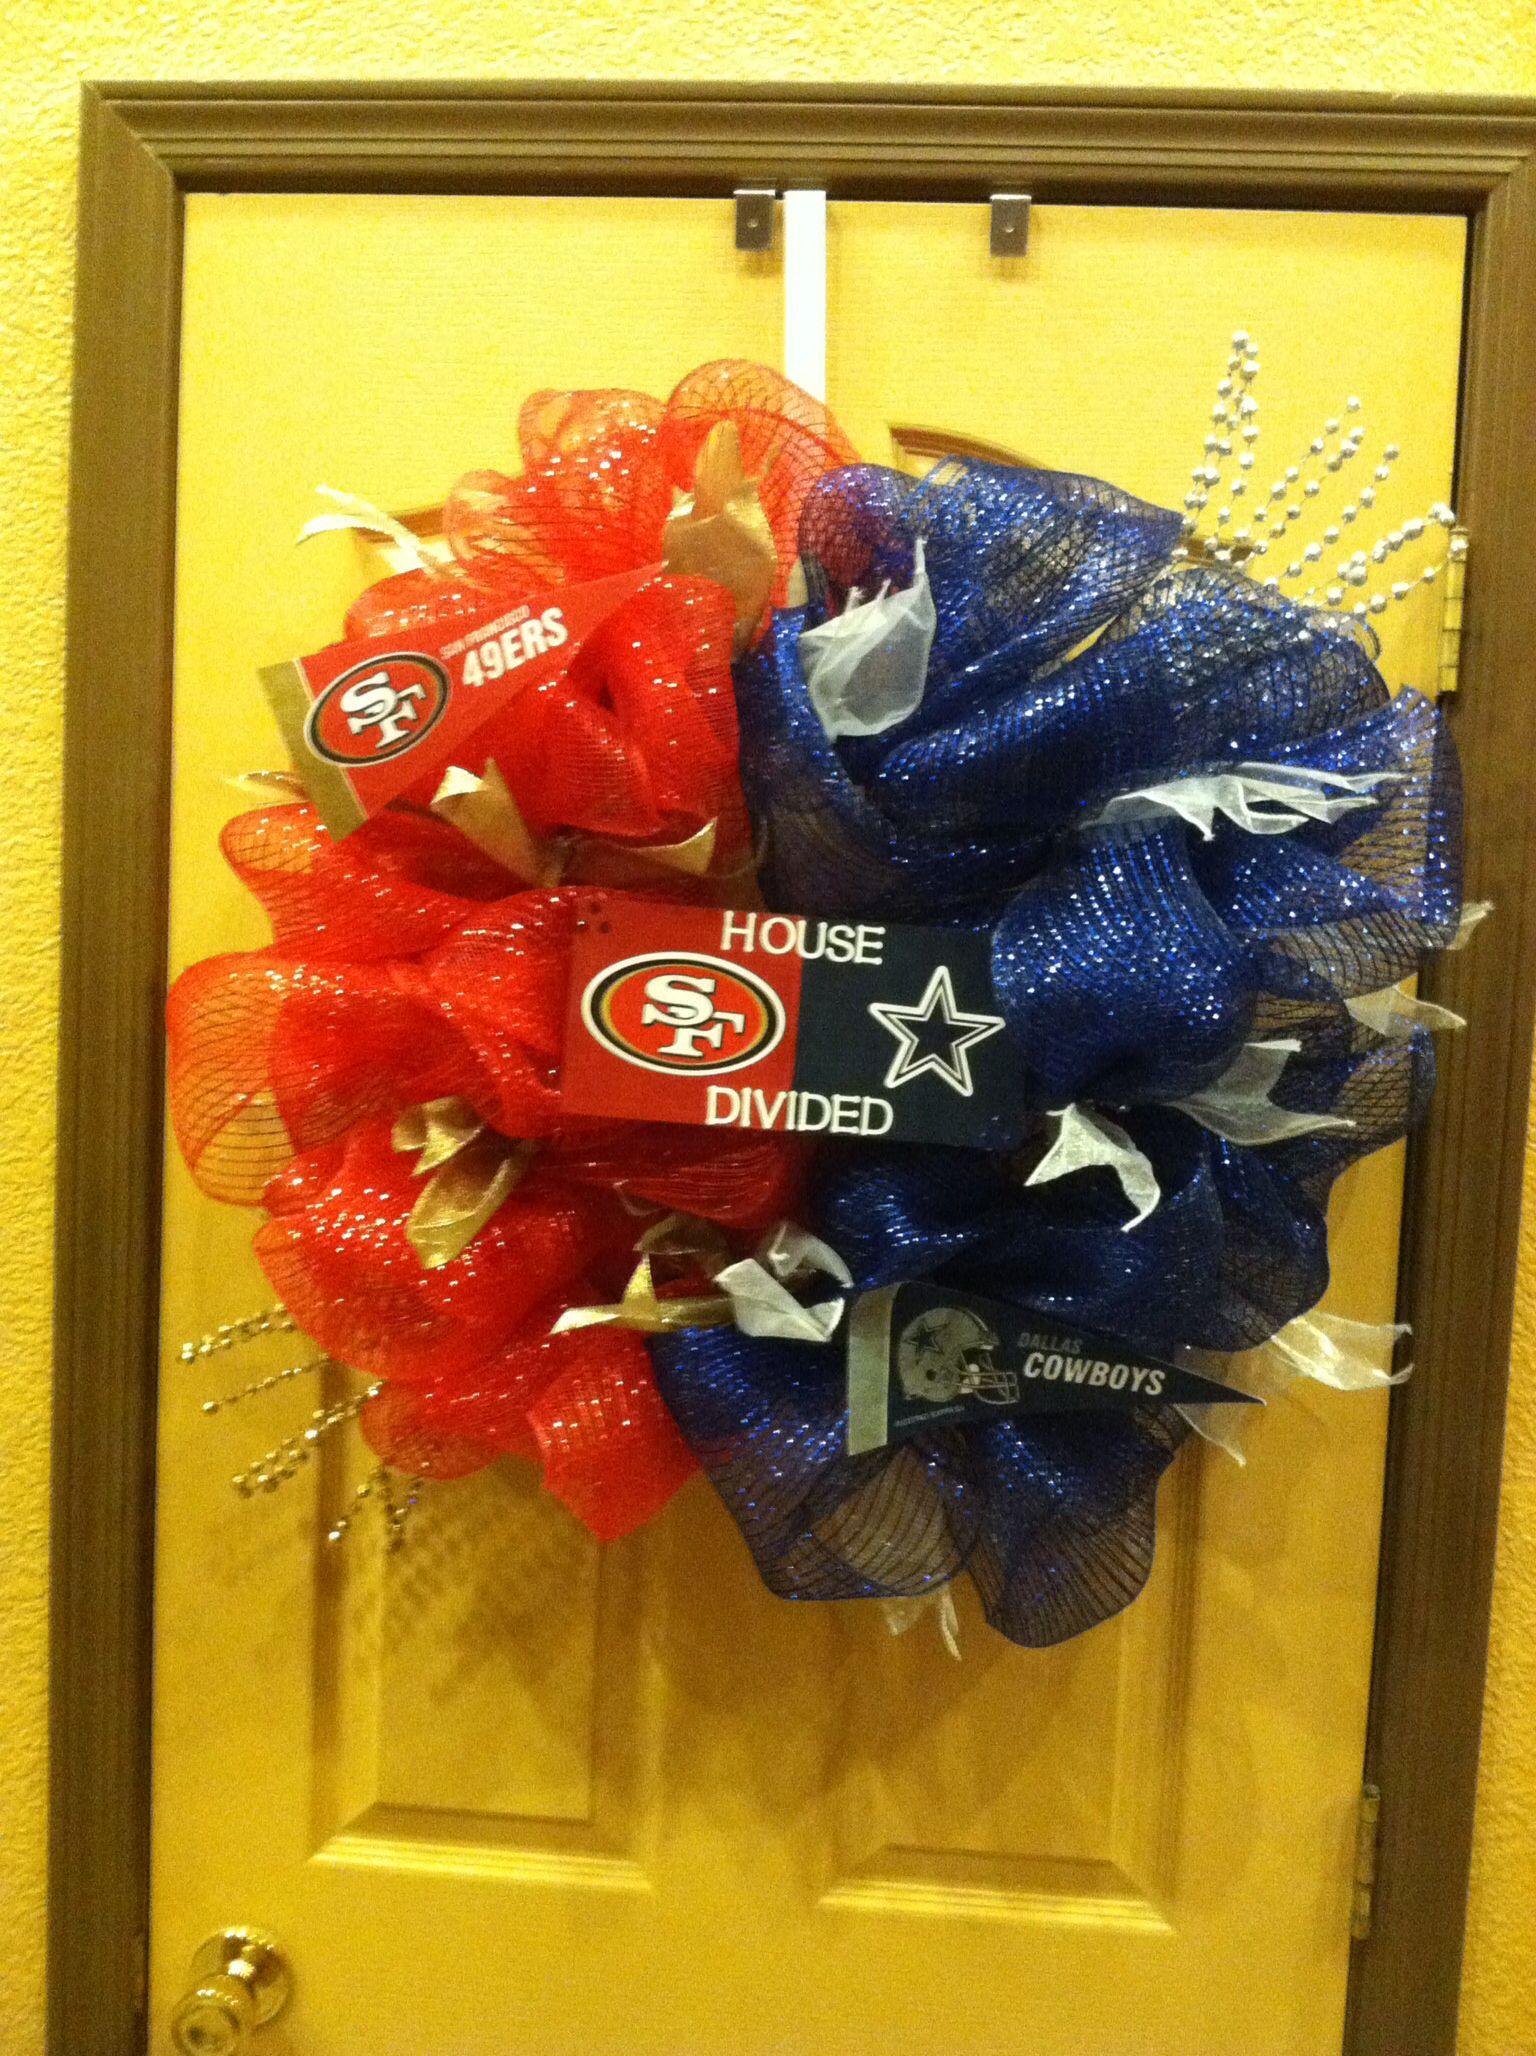 House divide wreath Half sf and half cowboys